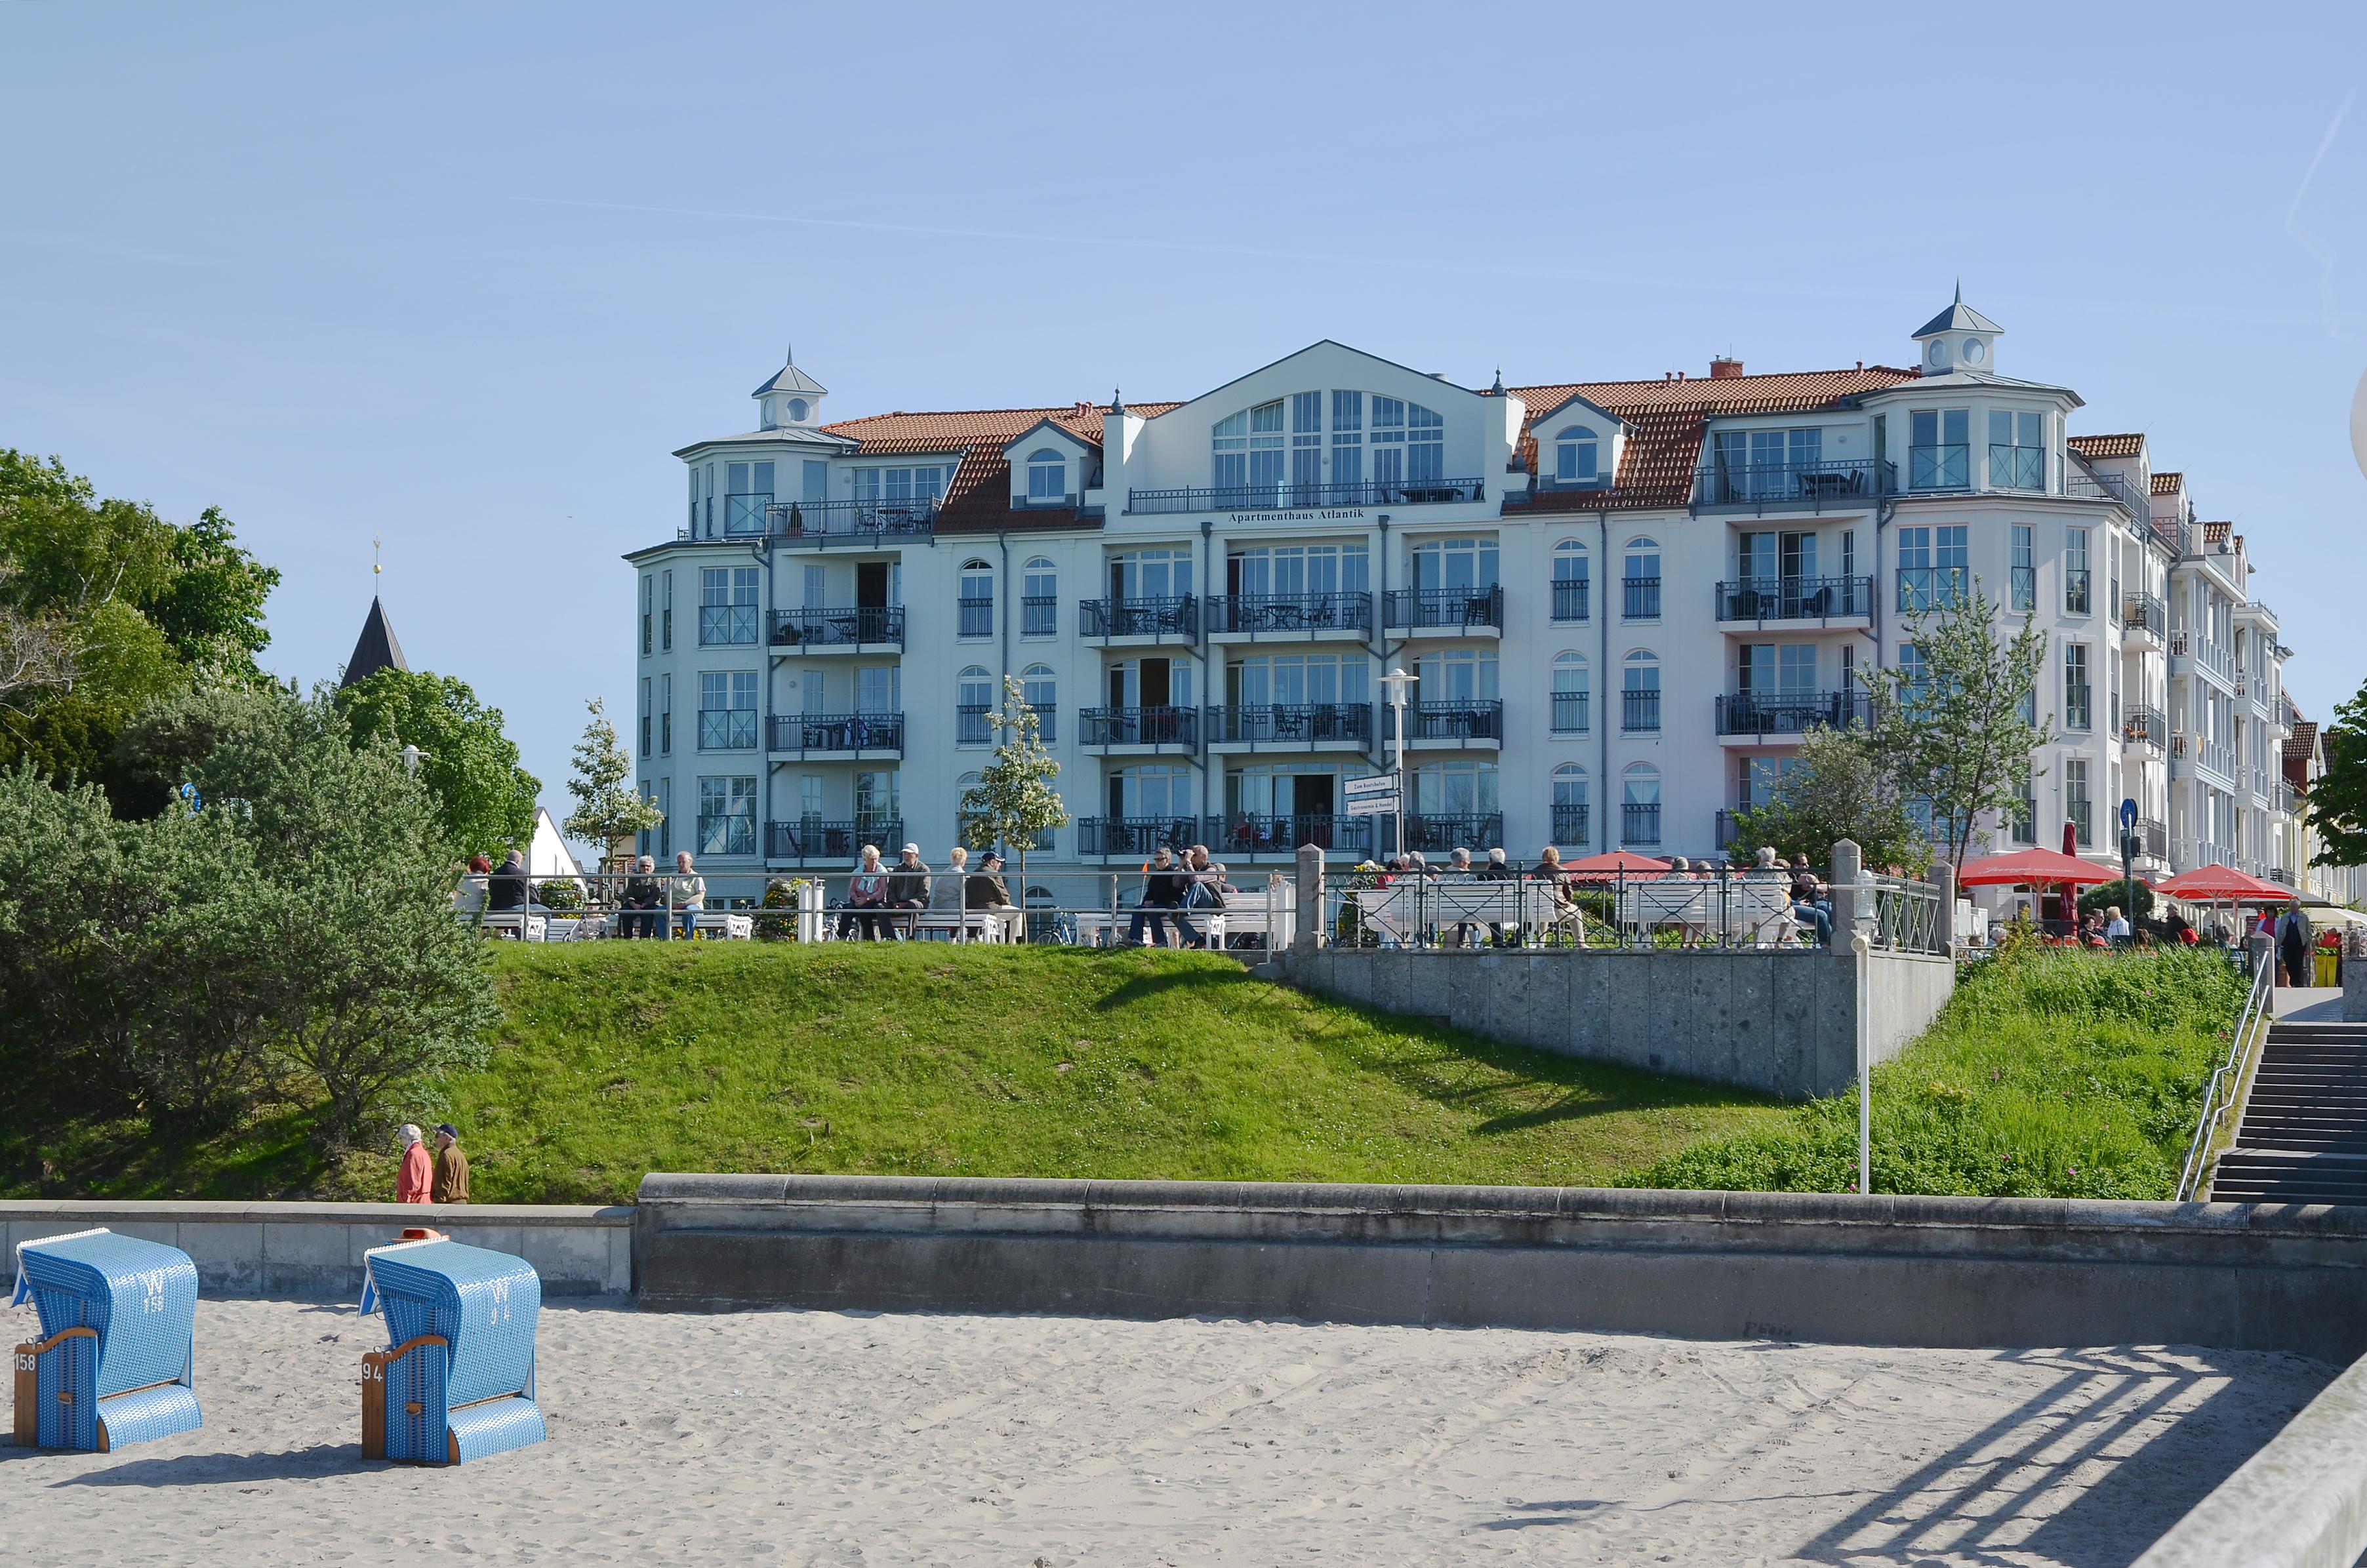 Spa Hotel Kuhlungsborn